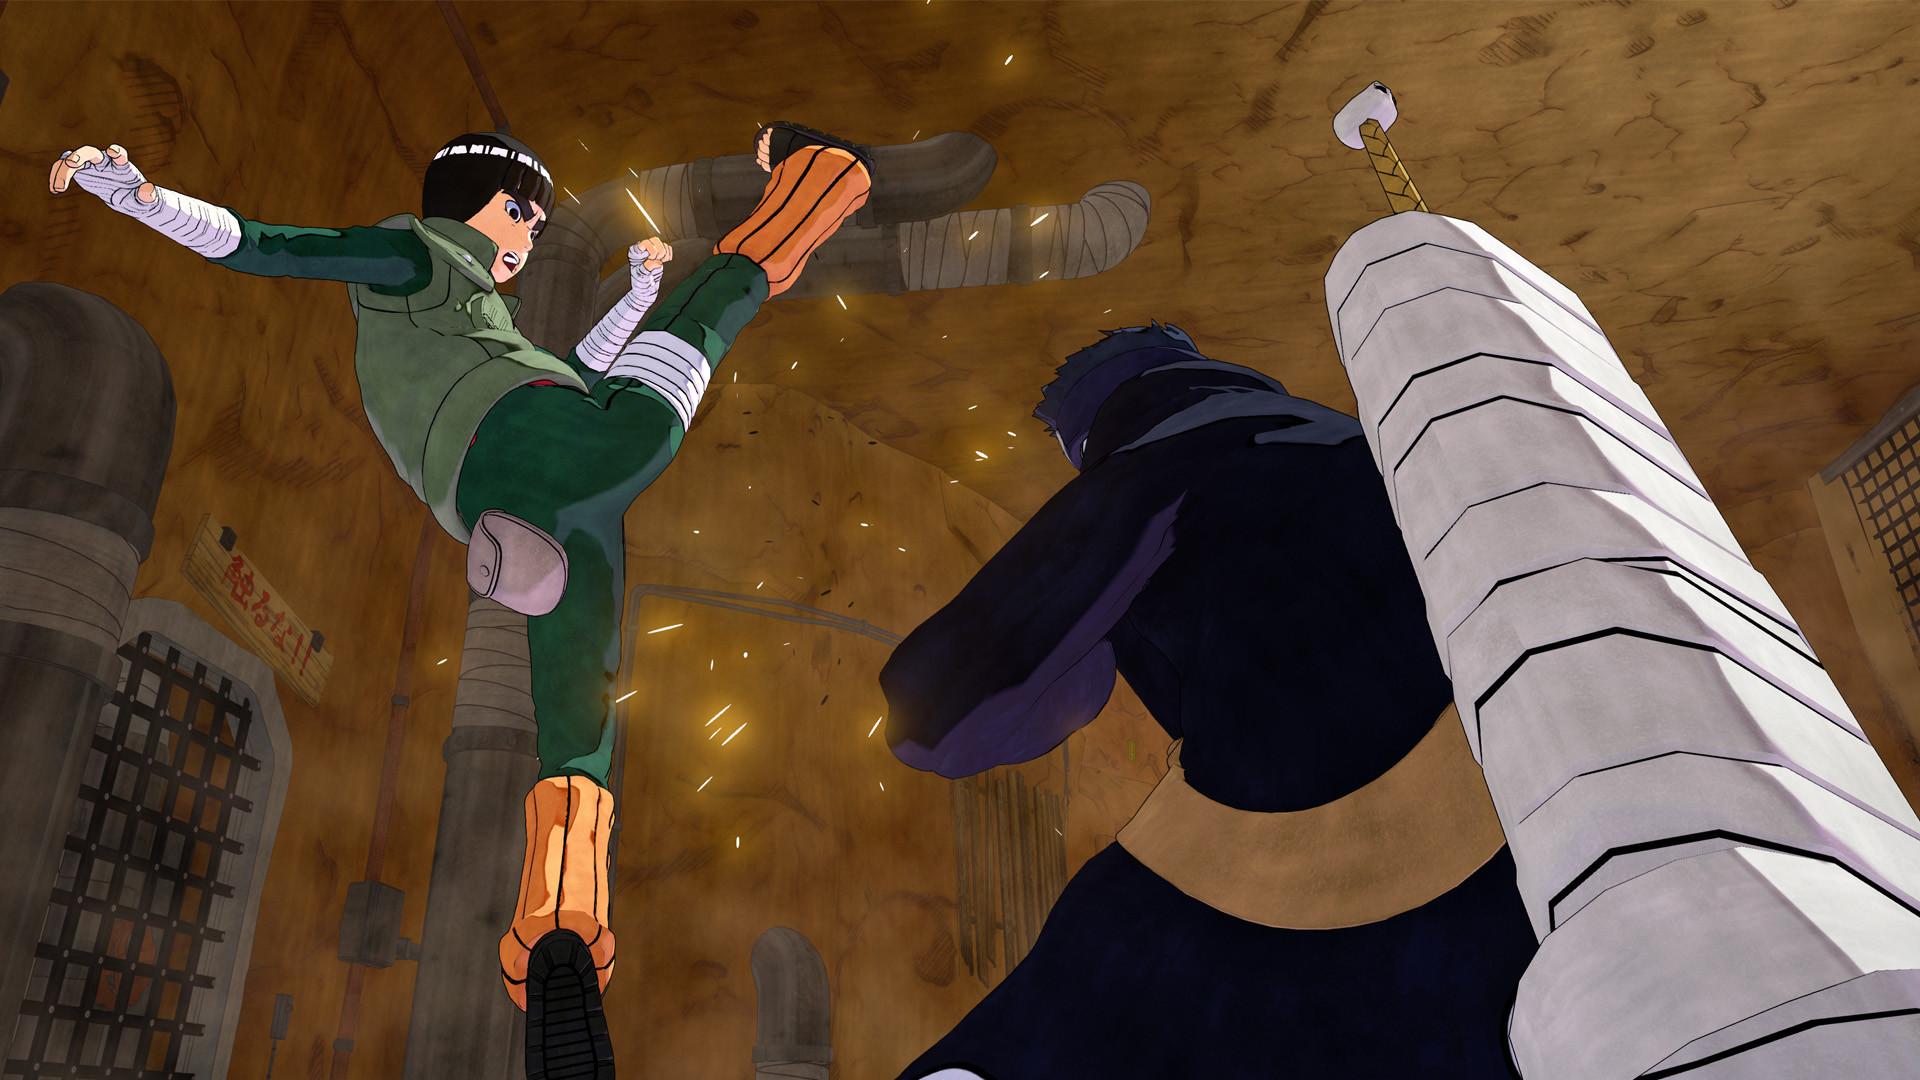 Naruto To Boruto Shinobi Striker Pc Get Cheap Cd Key on Cd Product Key Windows 10